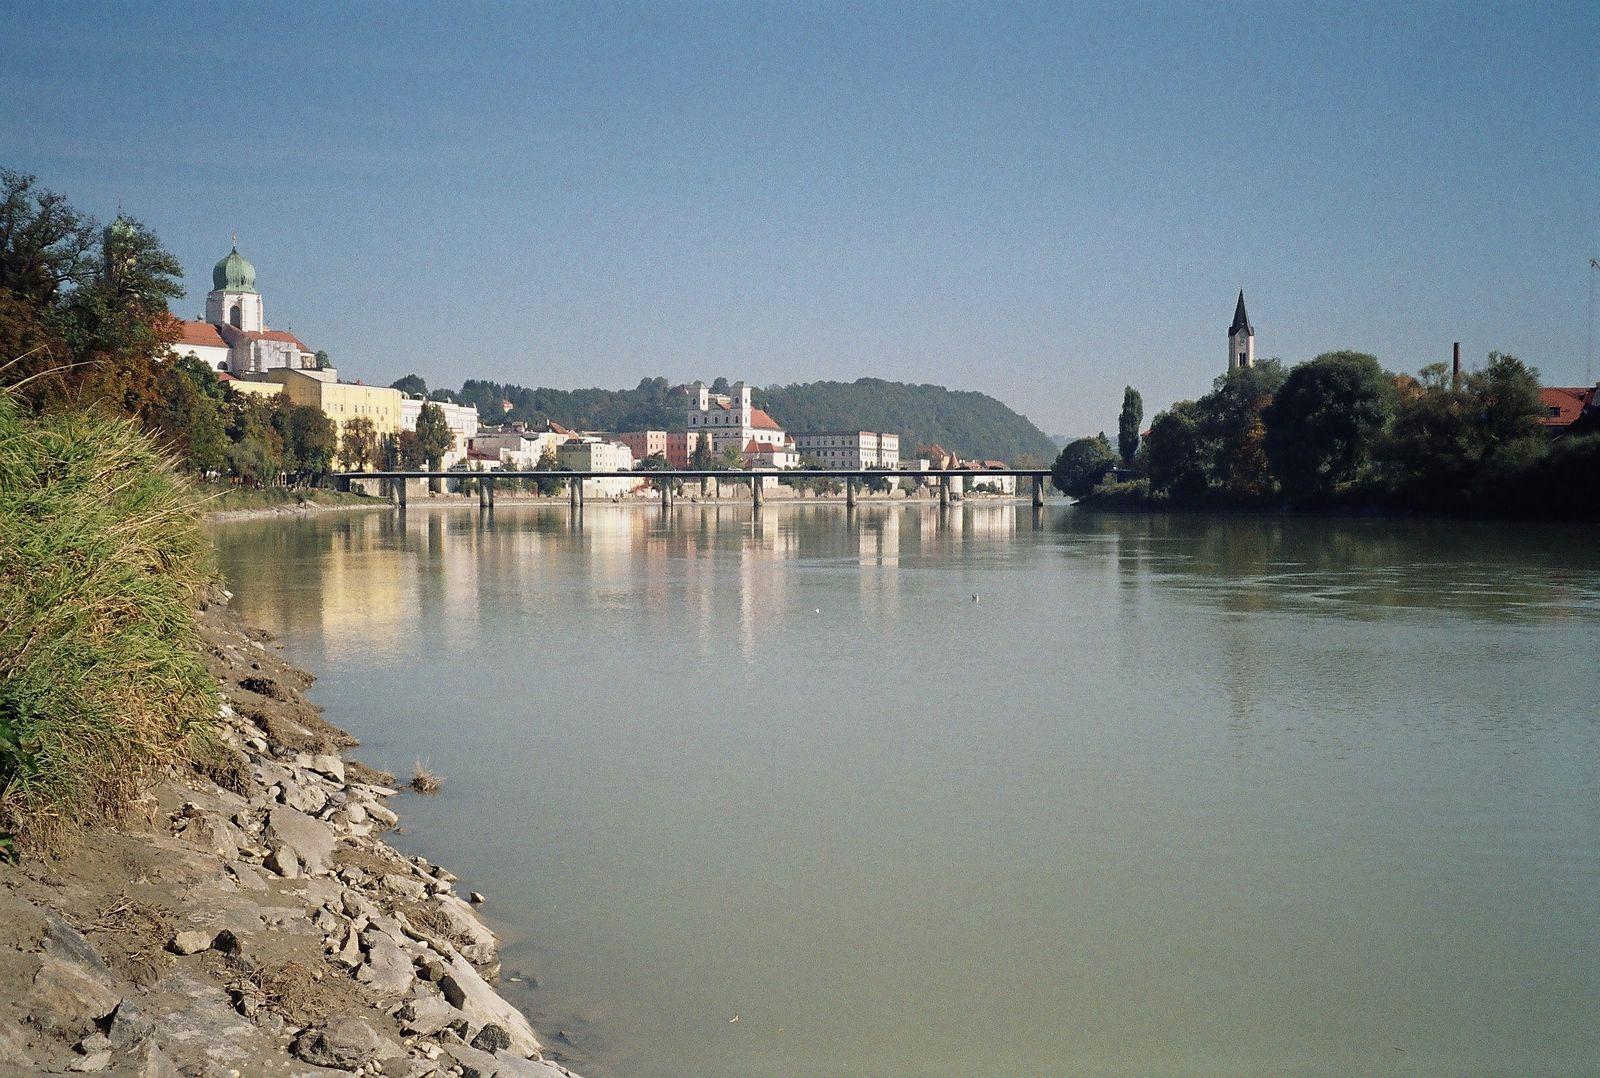 Photo: River Donau, Passau